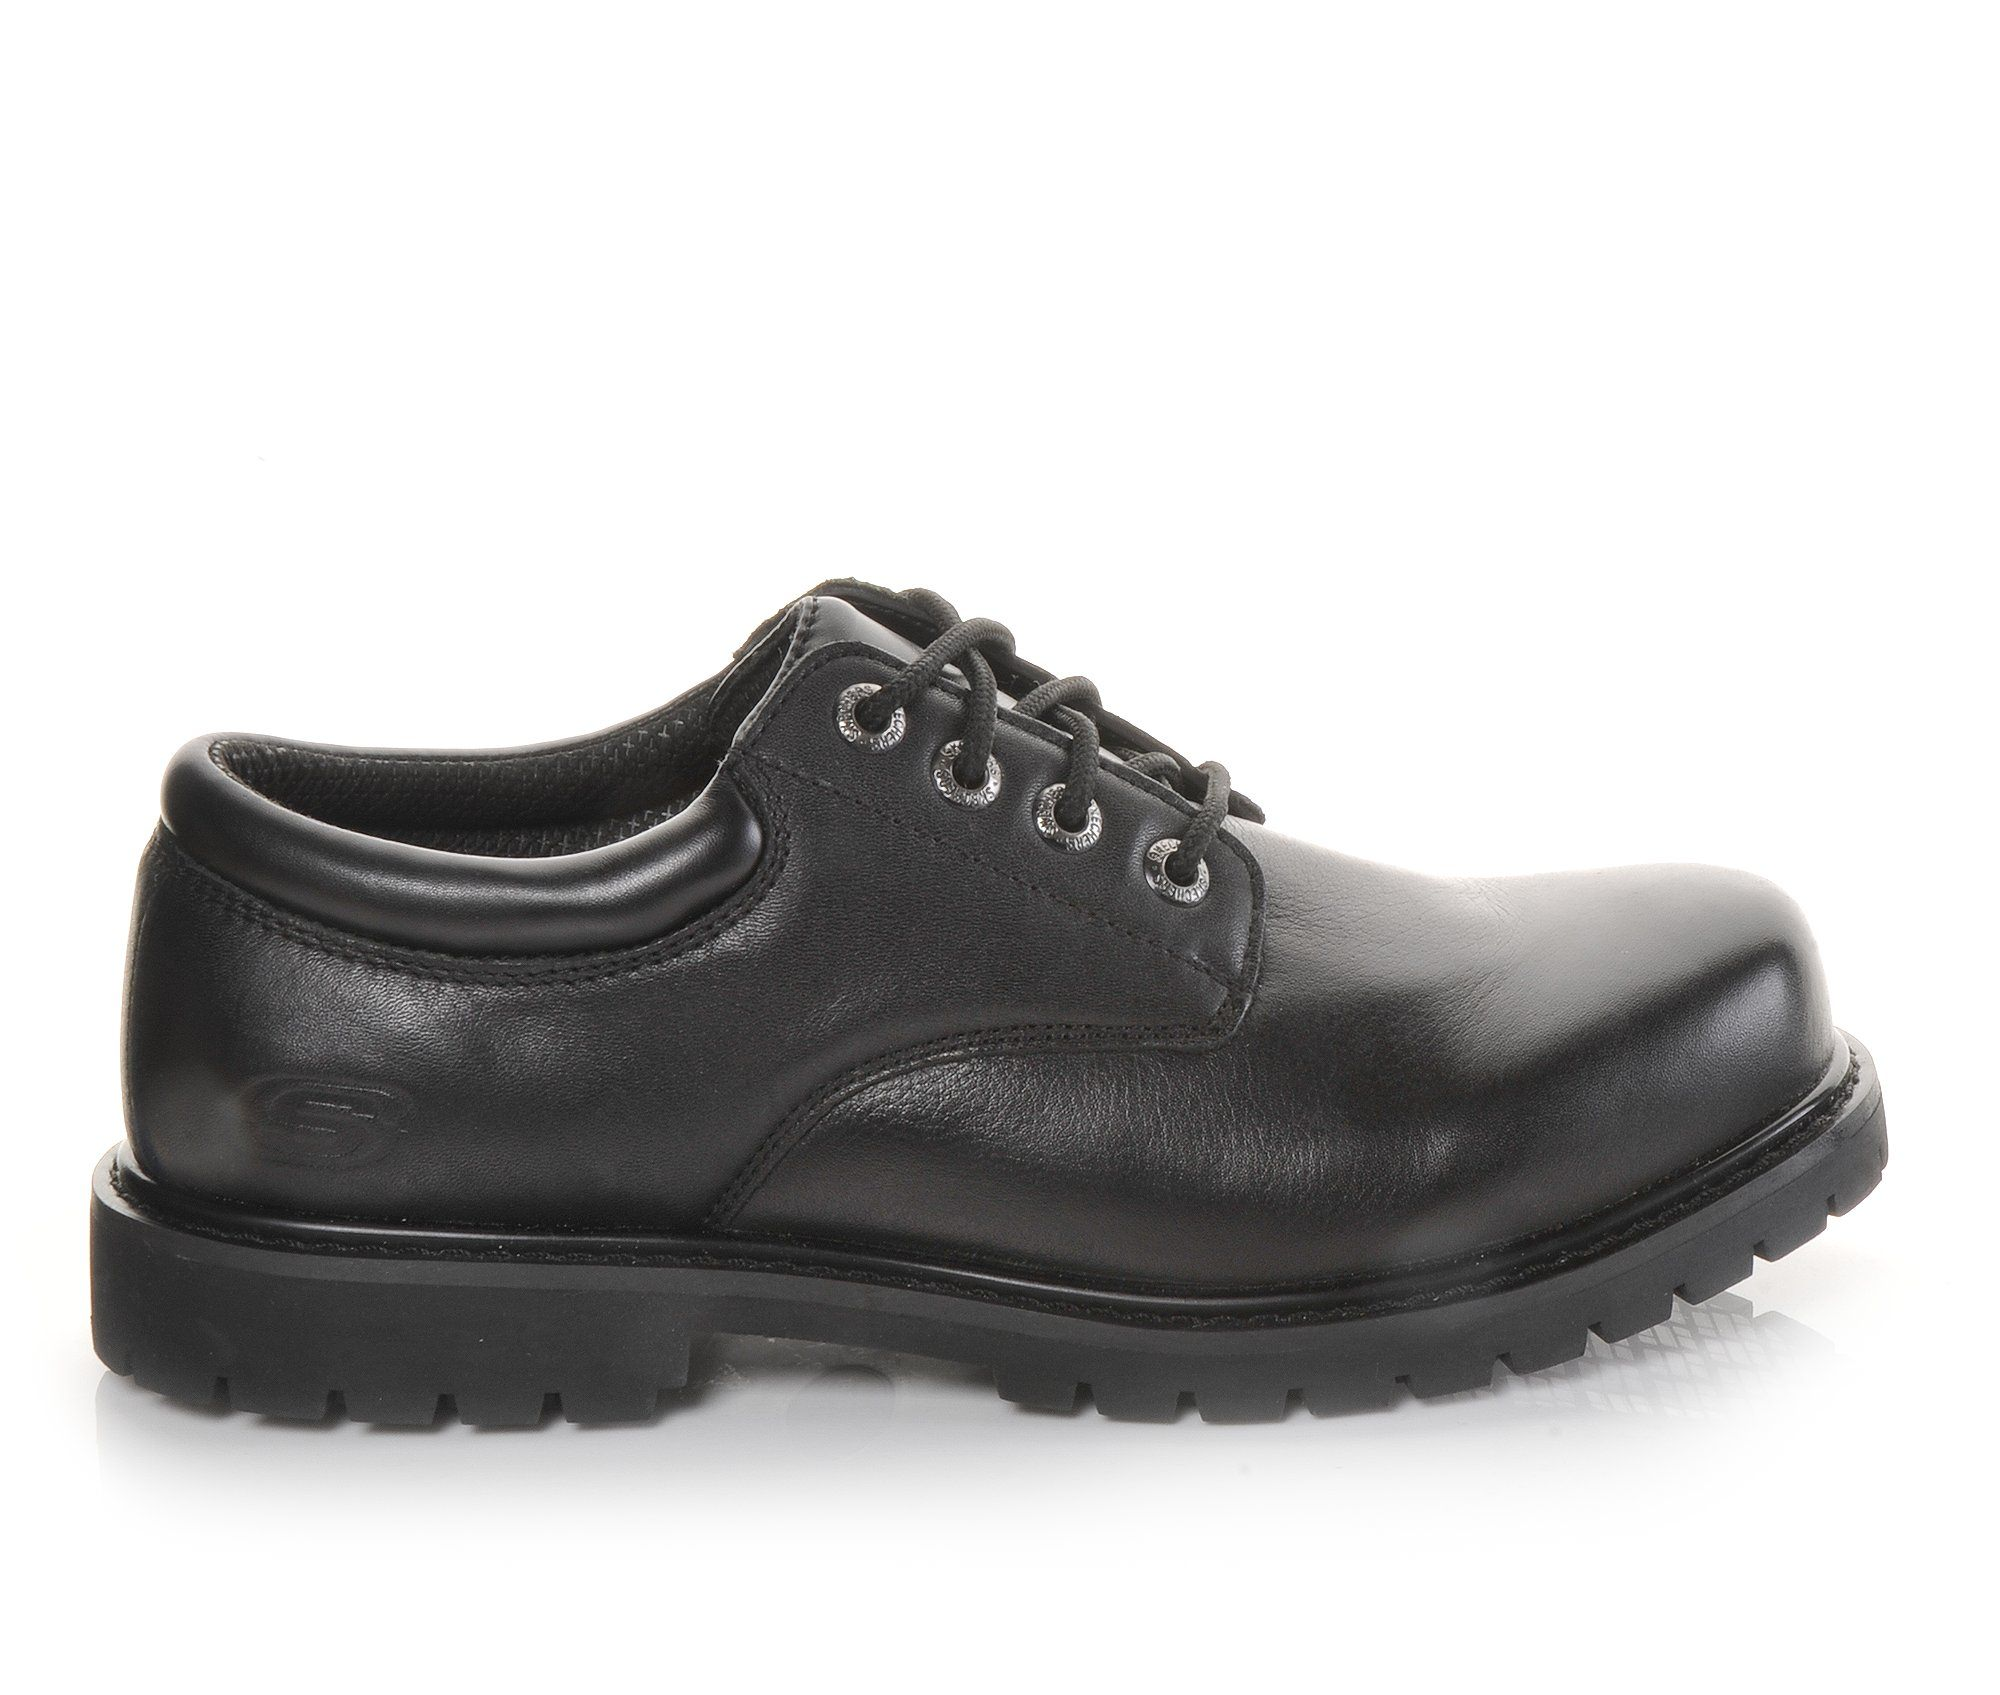 Skechers Work Elks Slip Resistant 77041 Men's Boots (Black Leather)